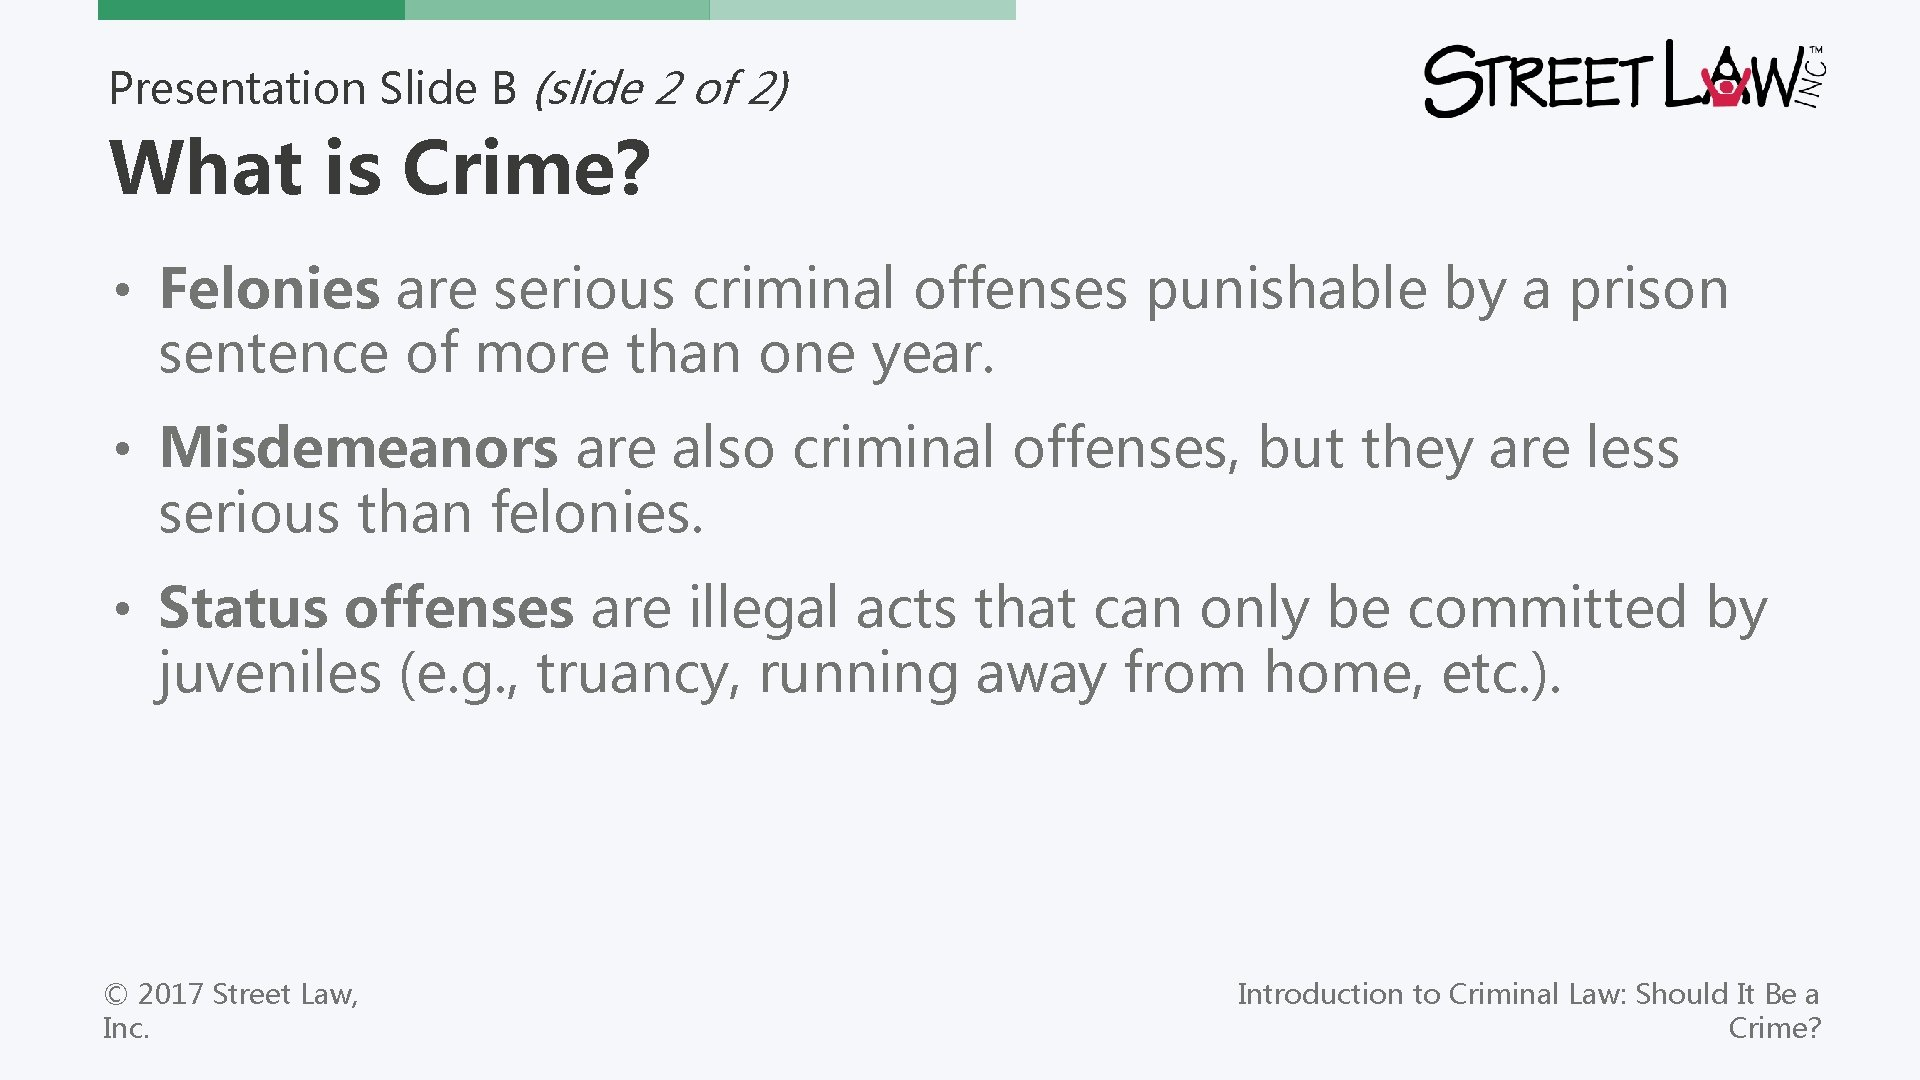 Presentation Slide B (slide 2 of 2) What is Crime? • Felonies are serious